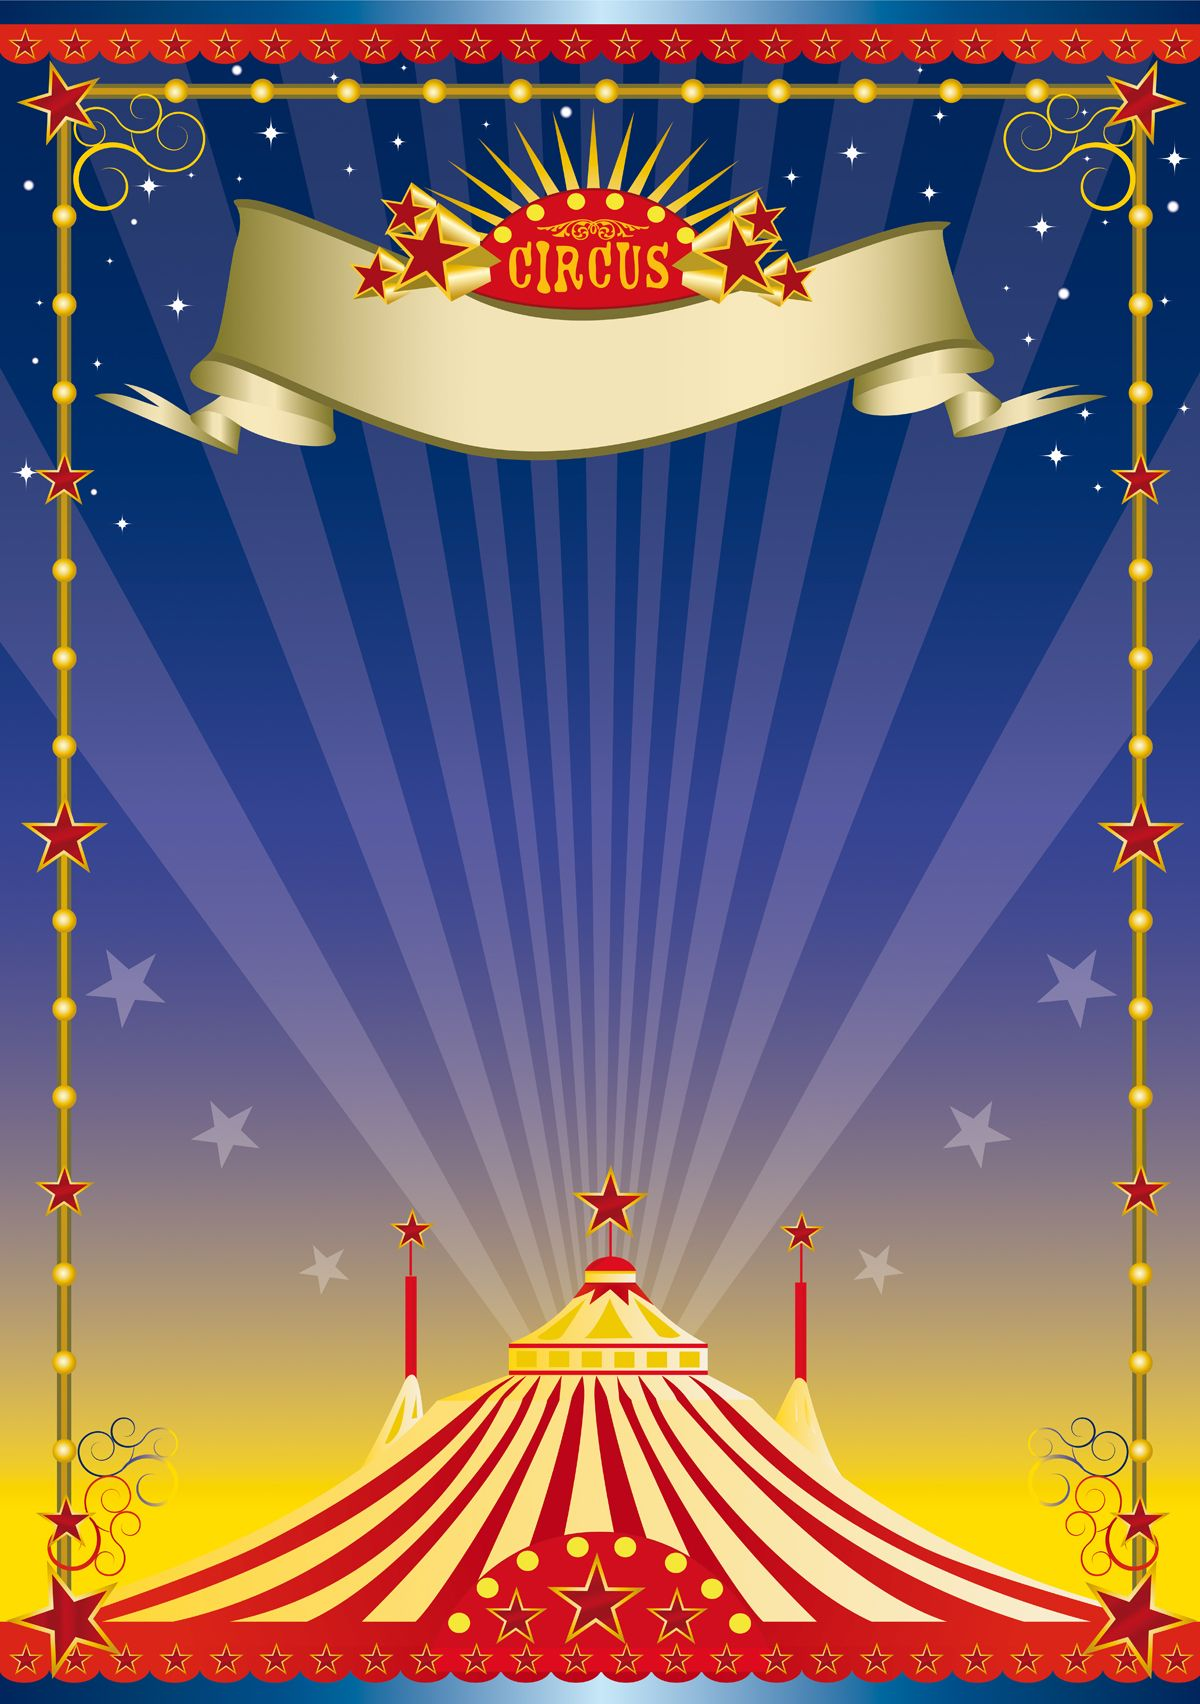 Urban Acrobatics: A Circus and Graffiti Spectacular: August 2013 ...